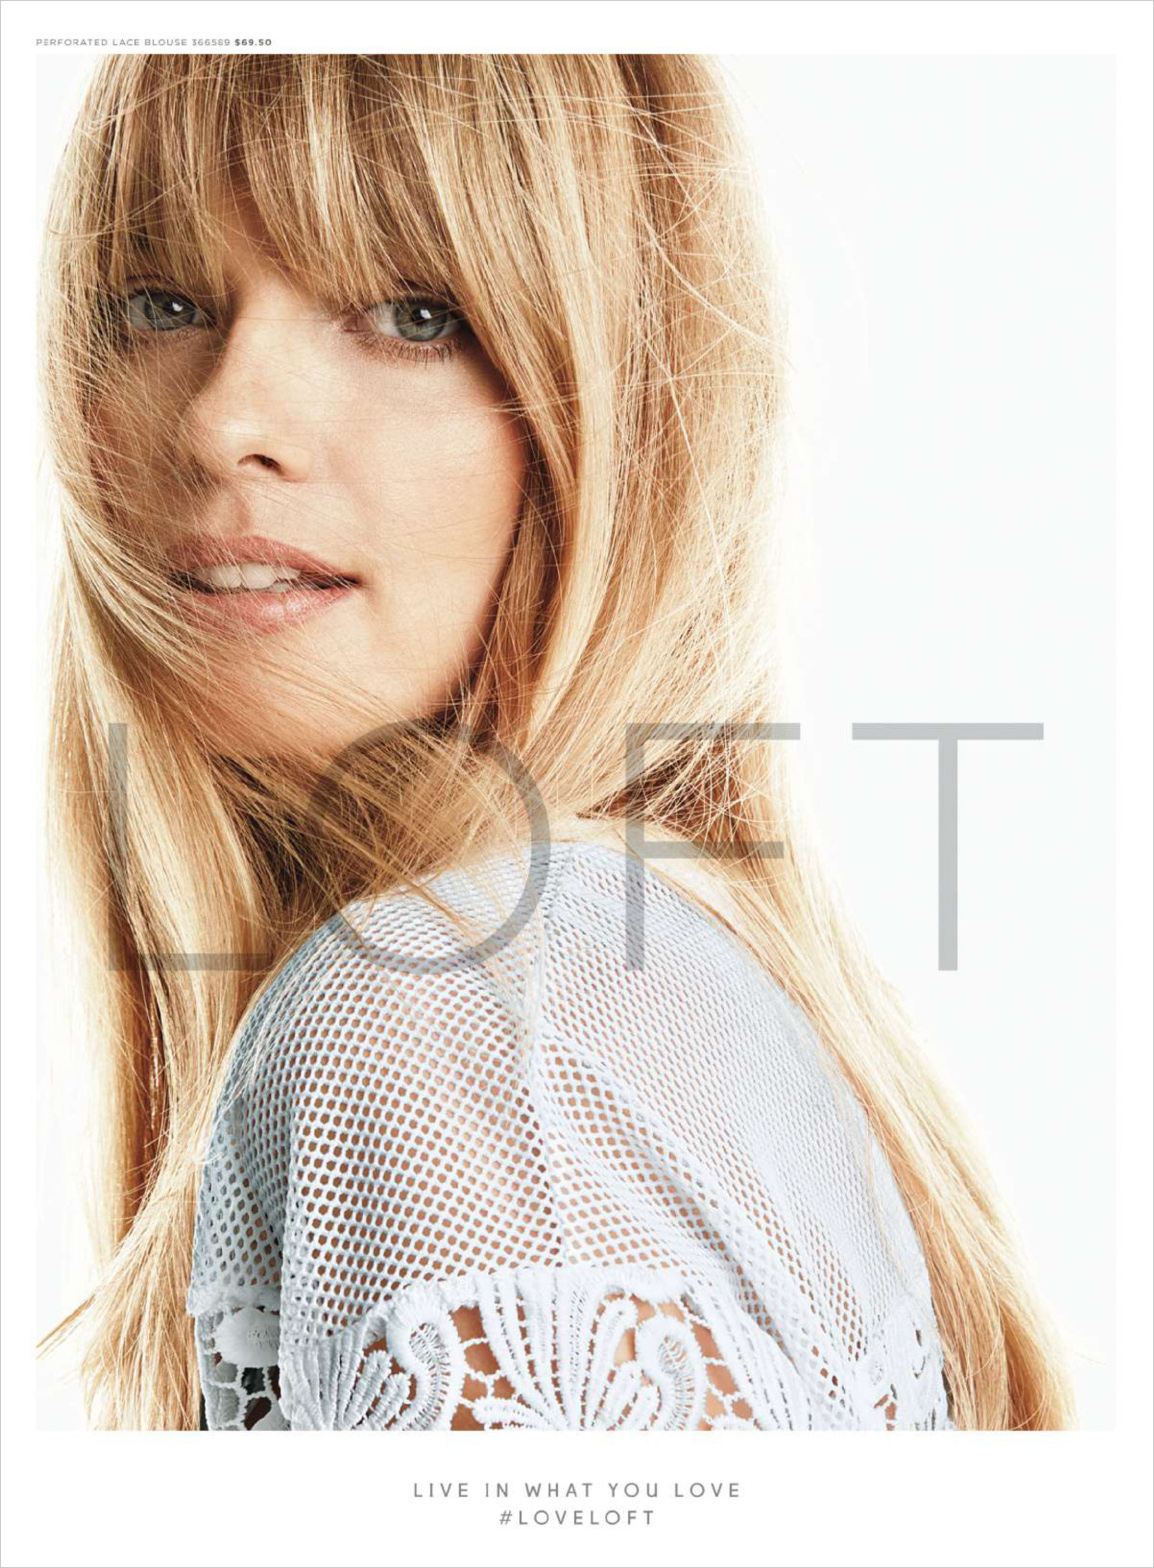 loft-spring-ad campaign-2015-the-impression-01